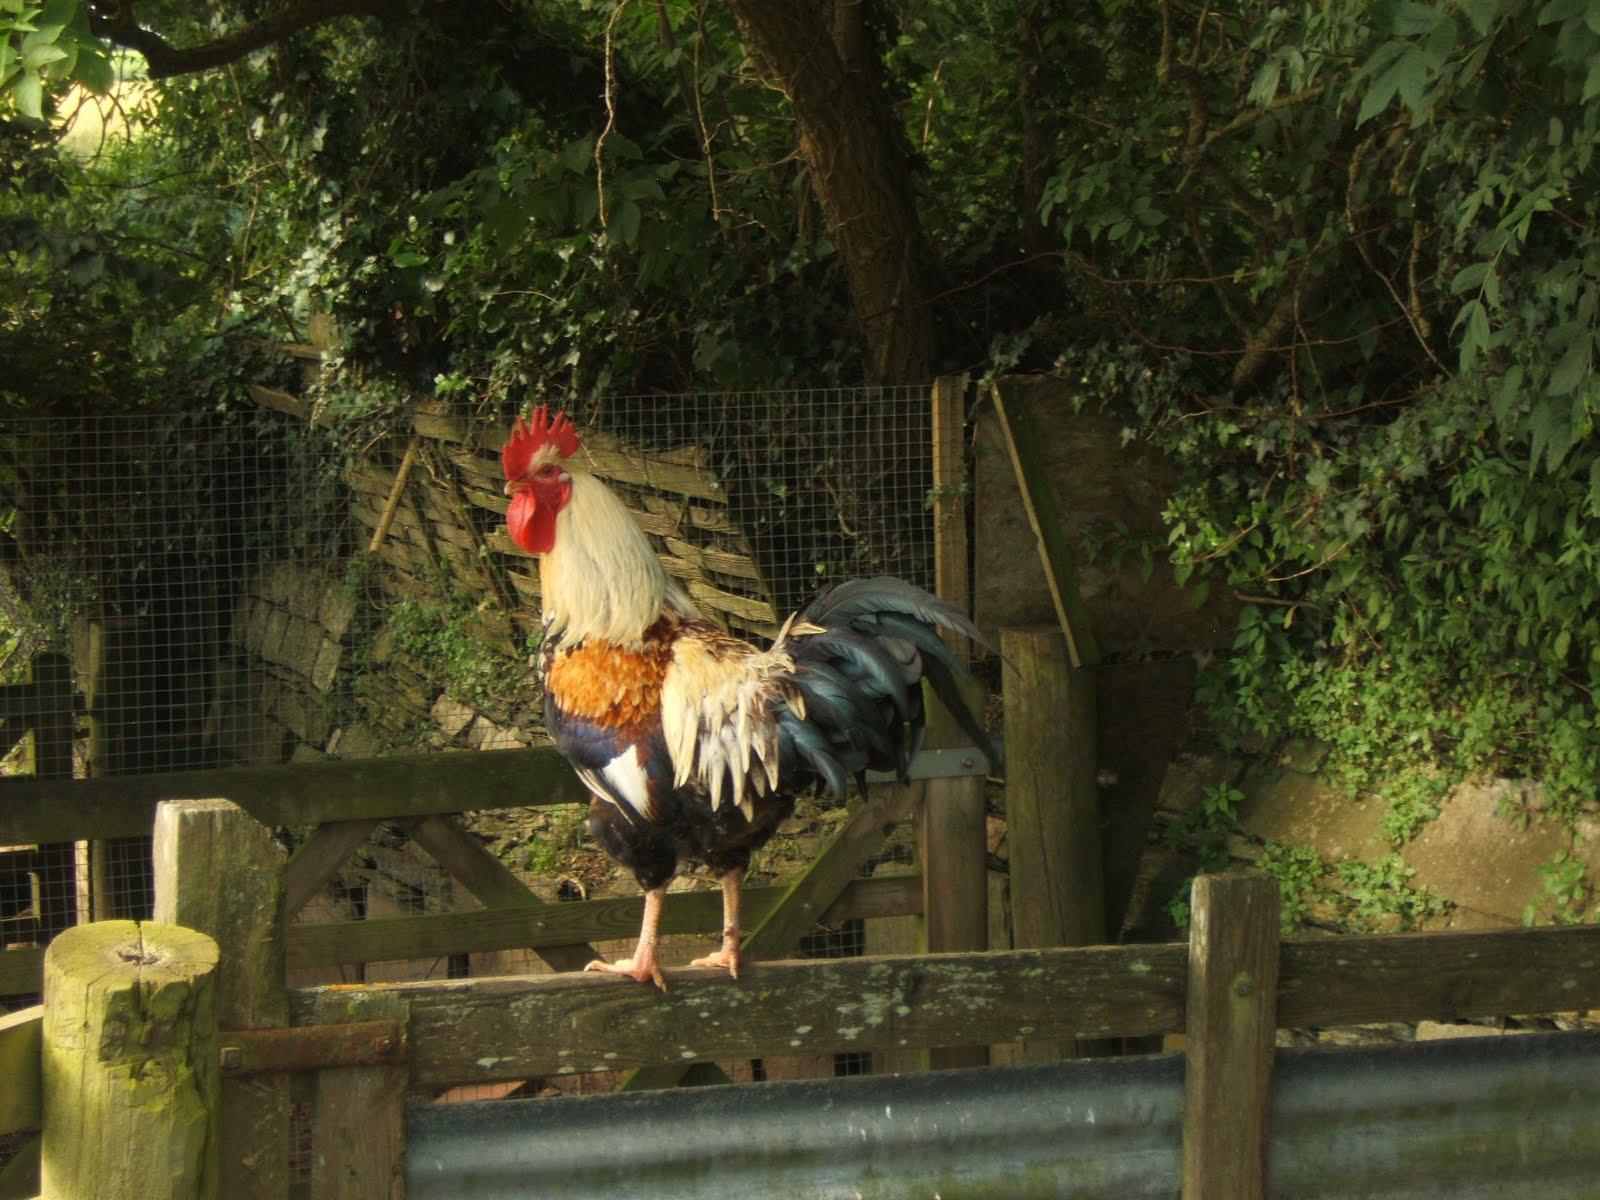 Bellecross Hens Poultry Catch Up